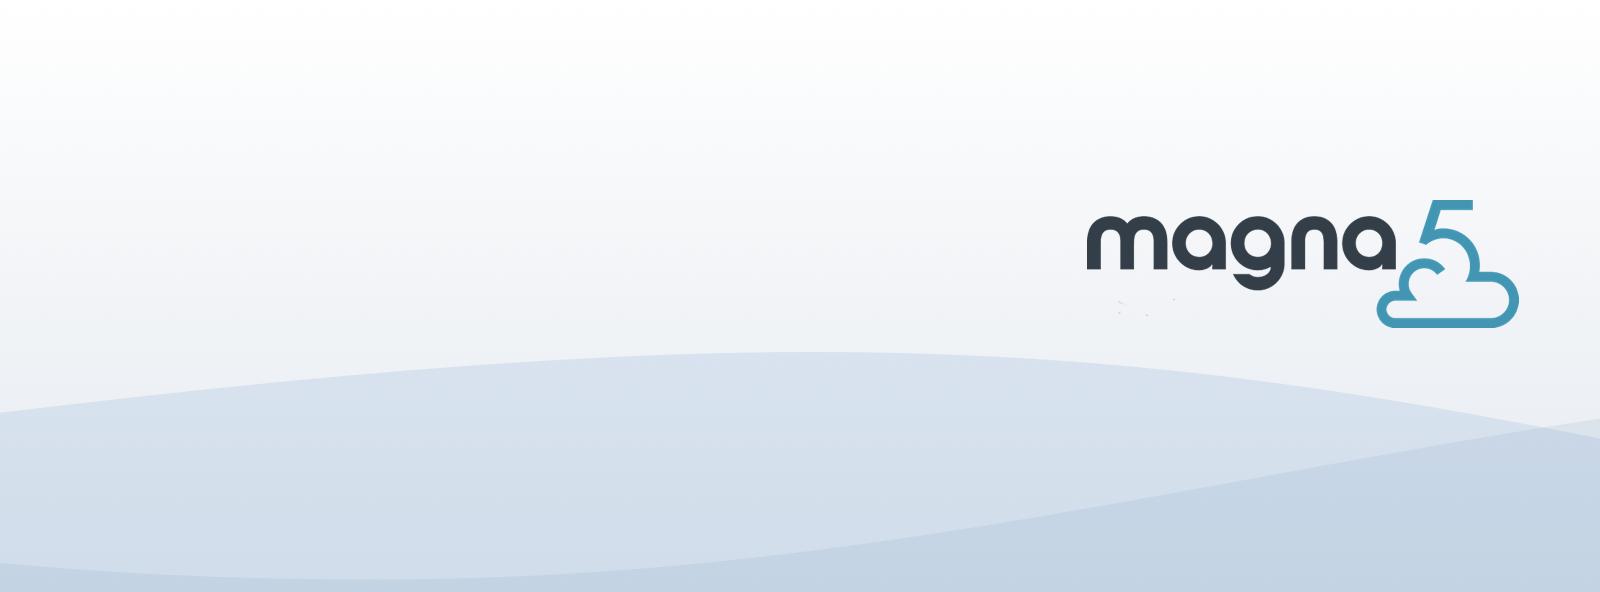 "Magna5 Calls GaggleAMP ""a Key Pillar"" of Its Marketing Efforts"